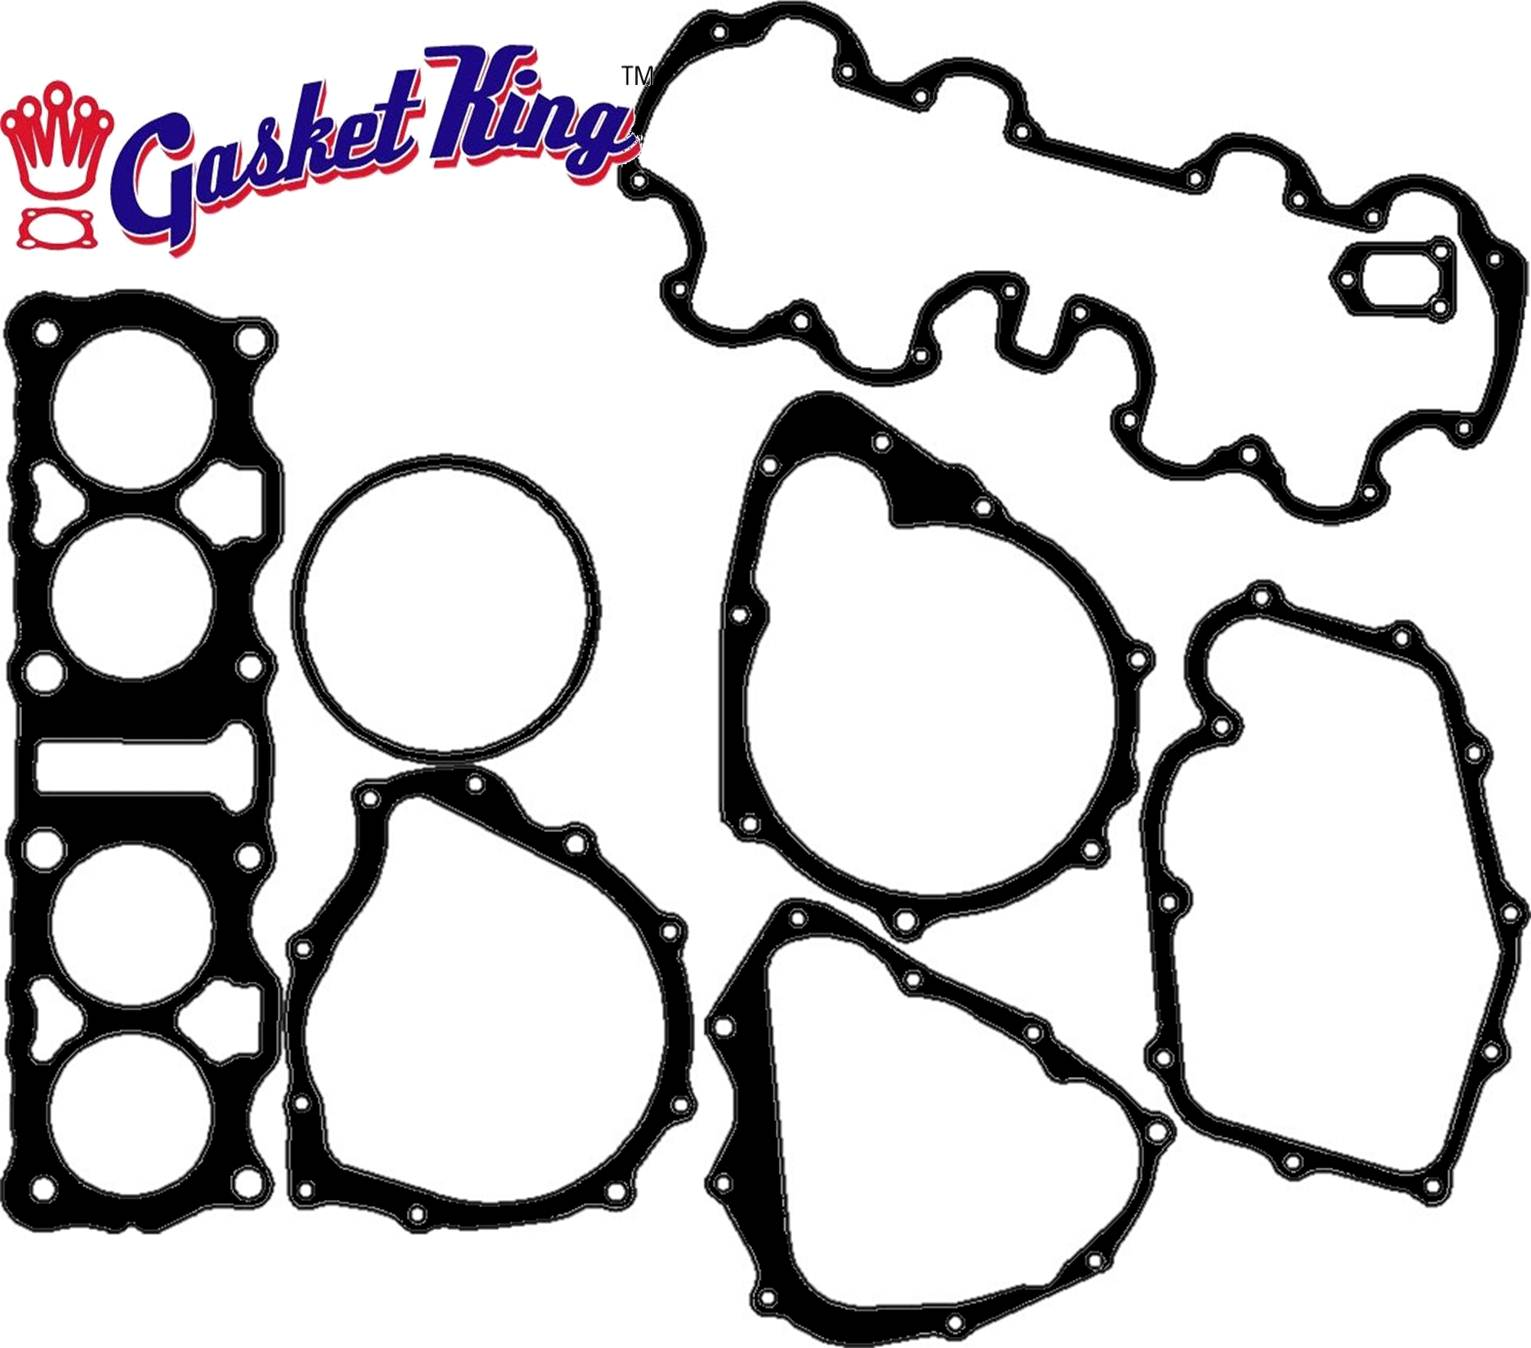 honda cb750 gaskets